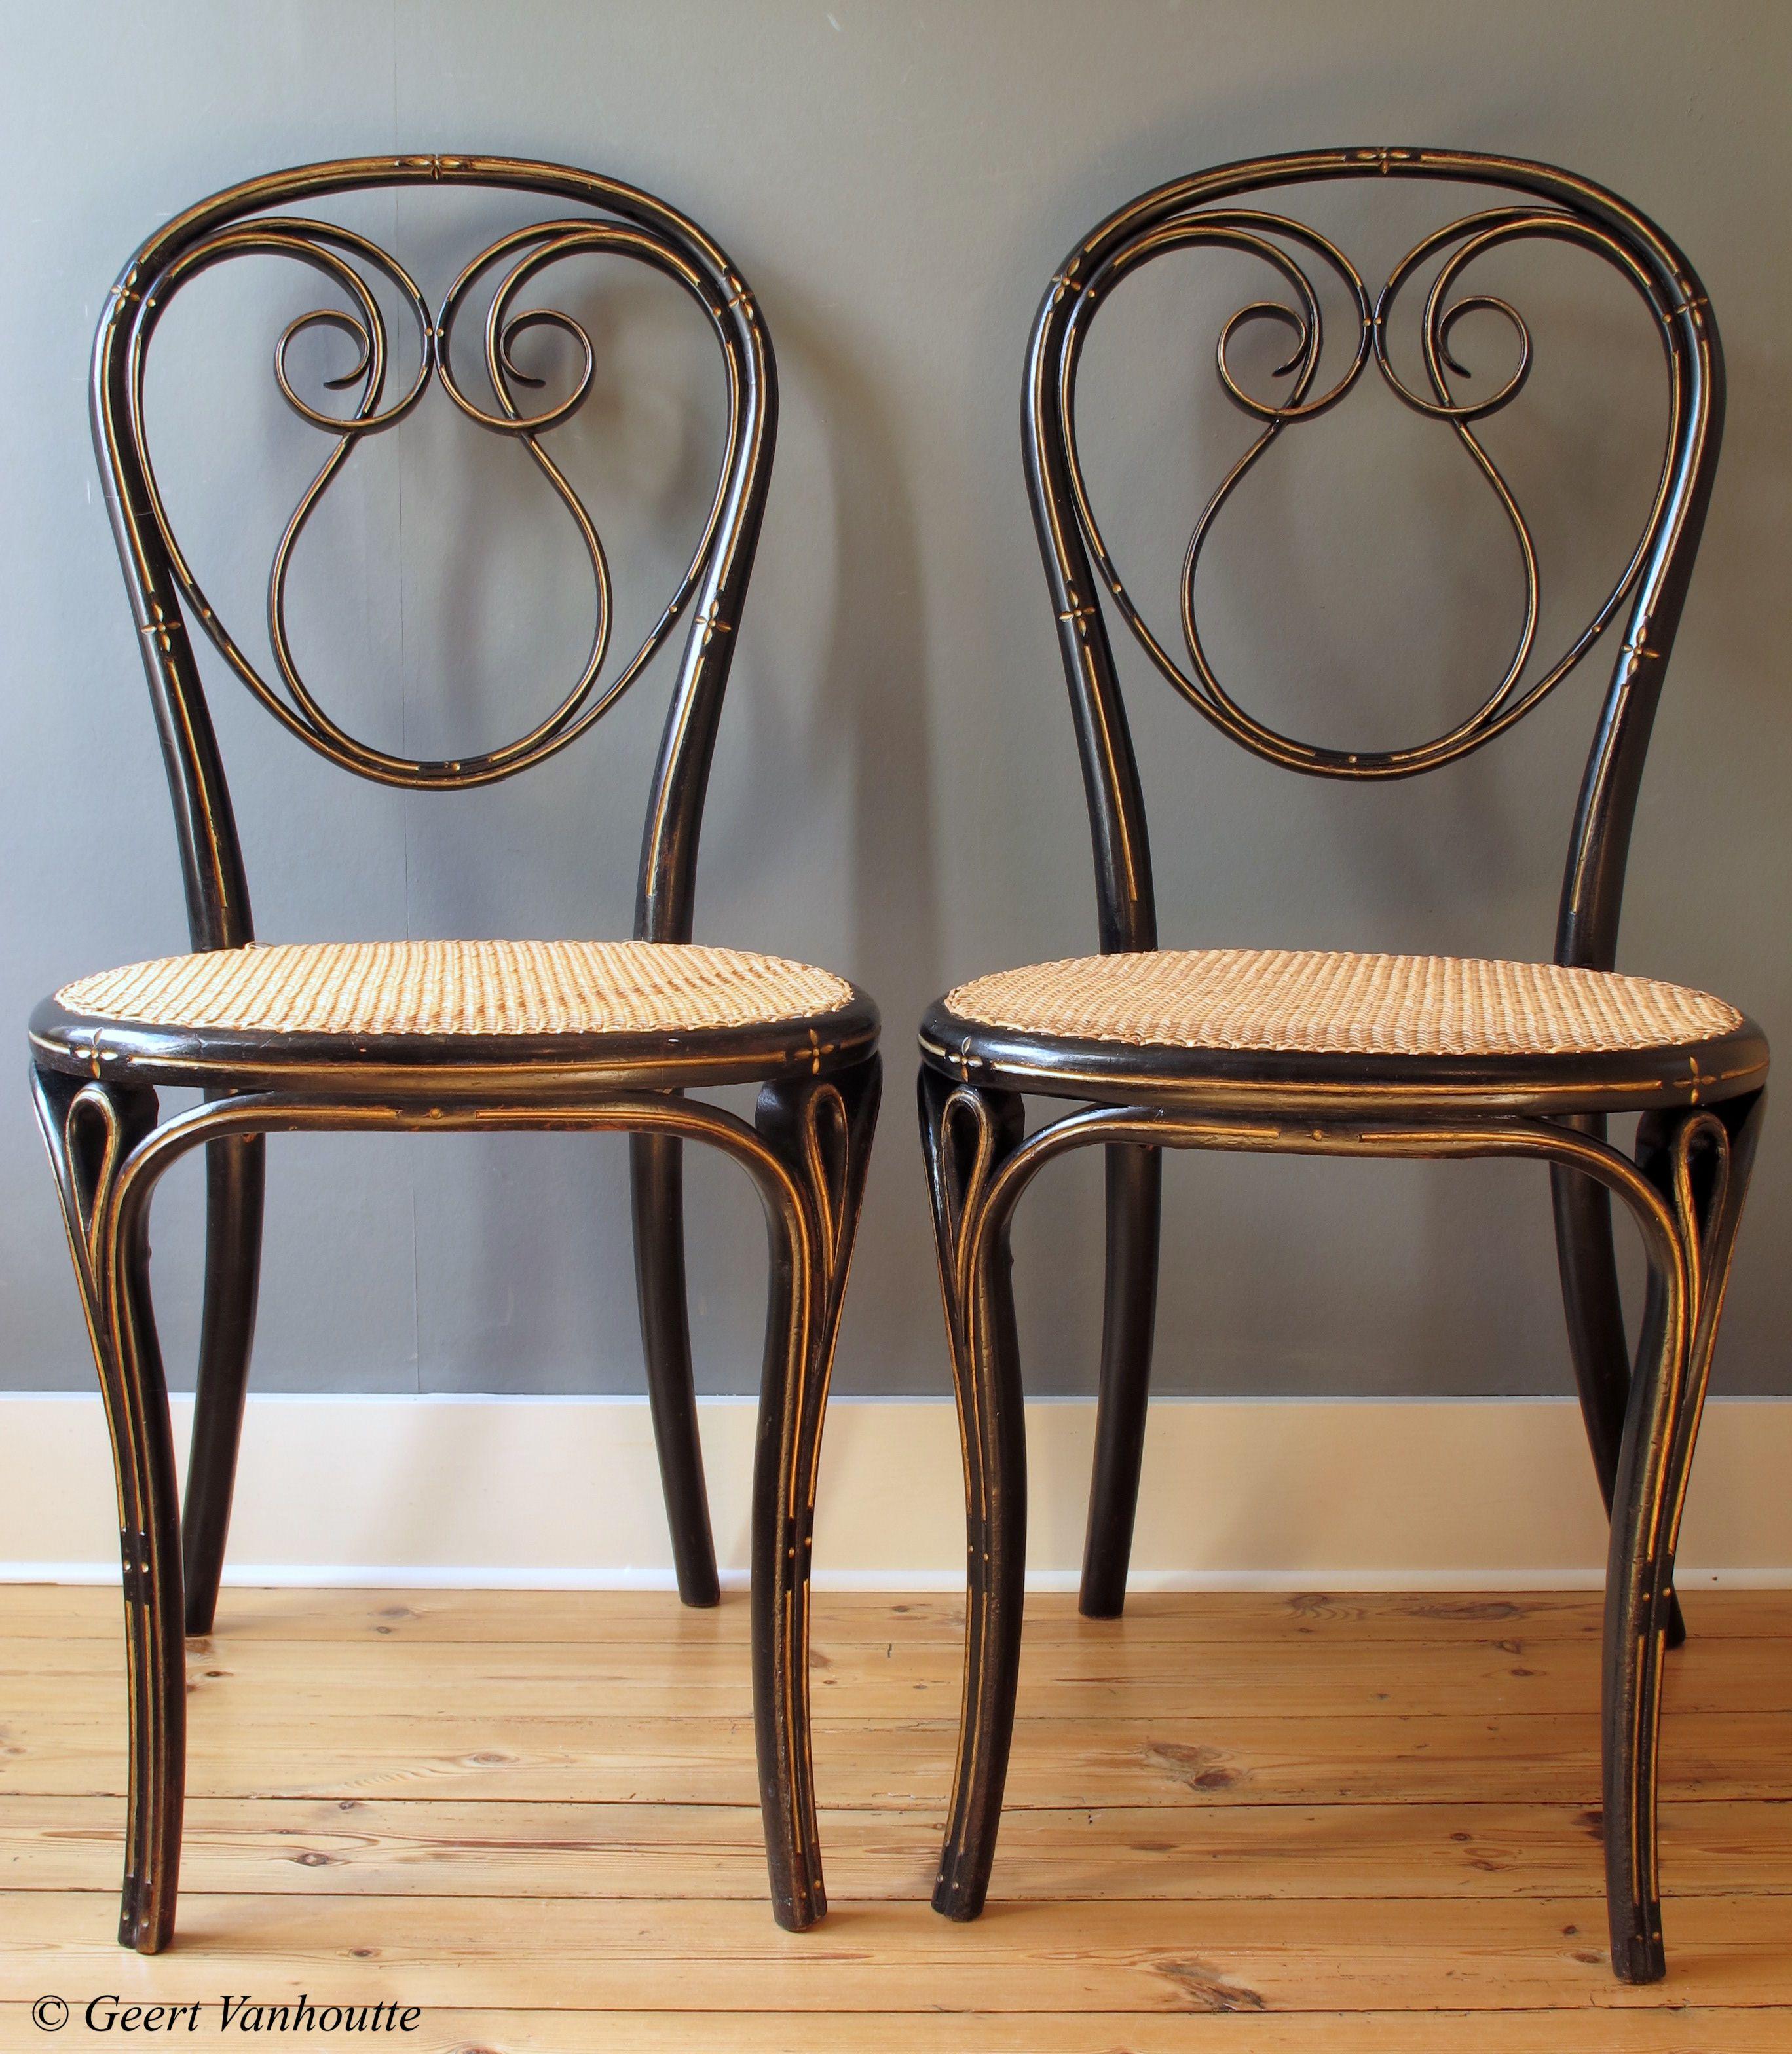 Thonet Sessel Nr 13 Ca 1862 1865 Art Nouveau Furniture Thonet Chair Outdoor Dining Chair Cushions